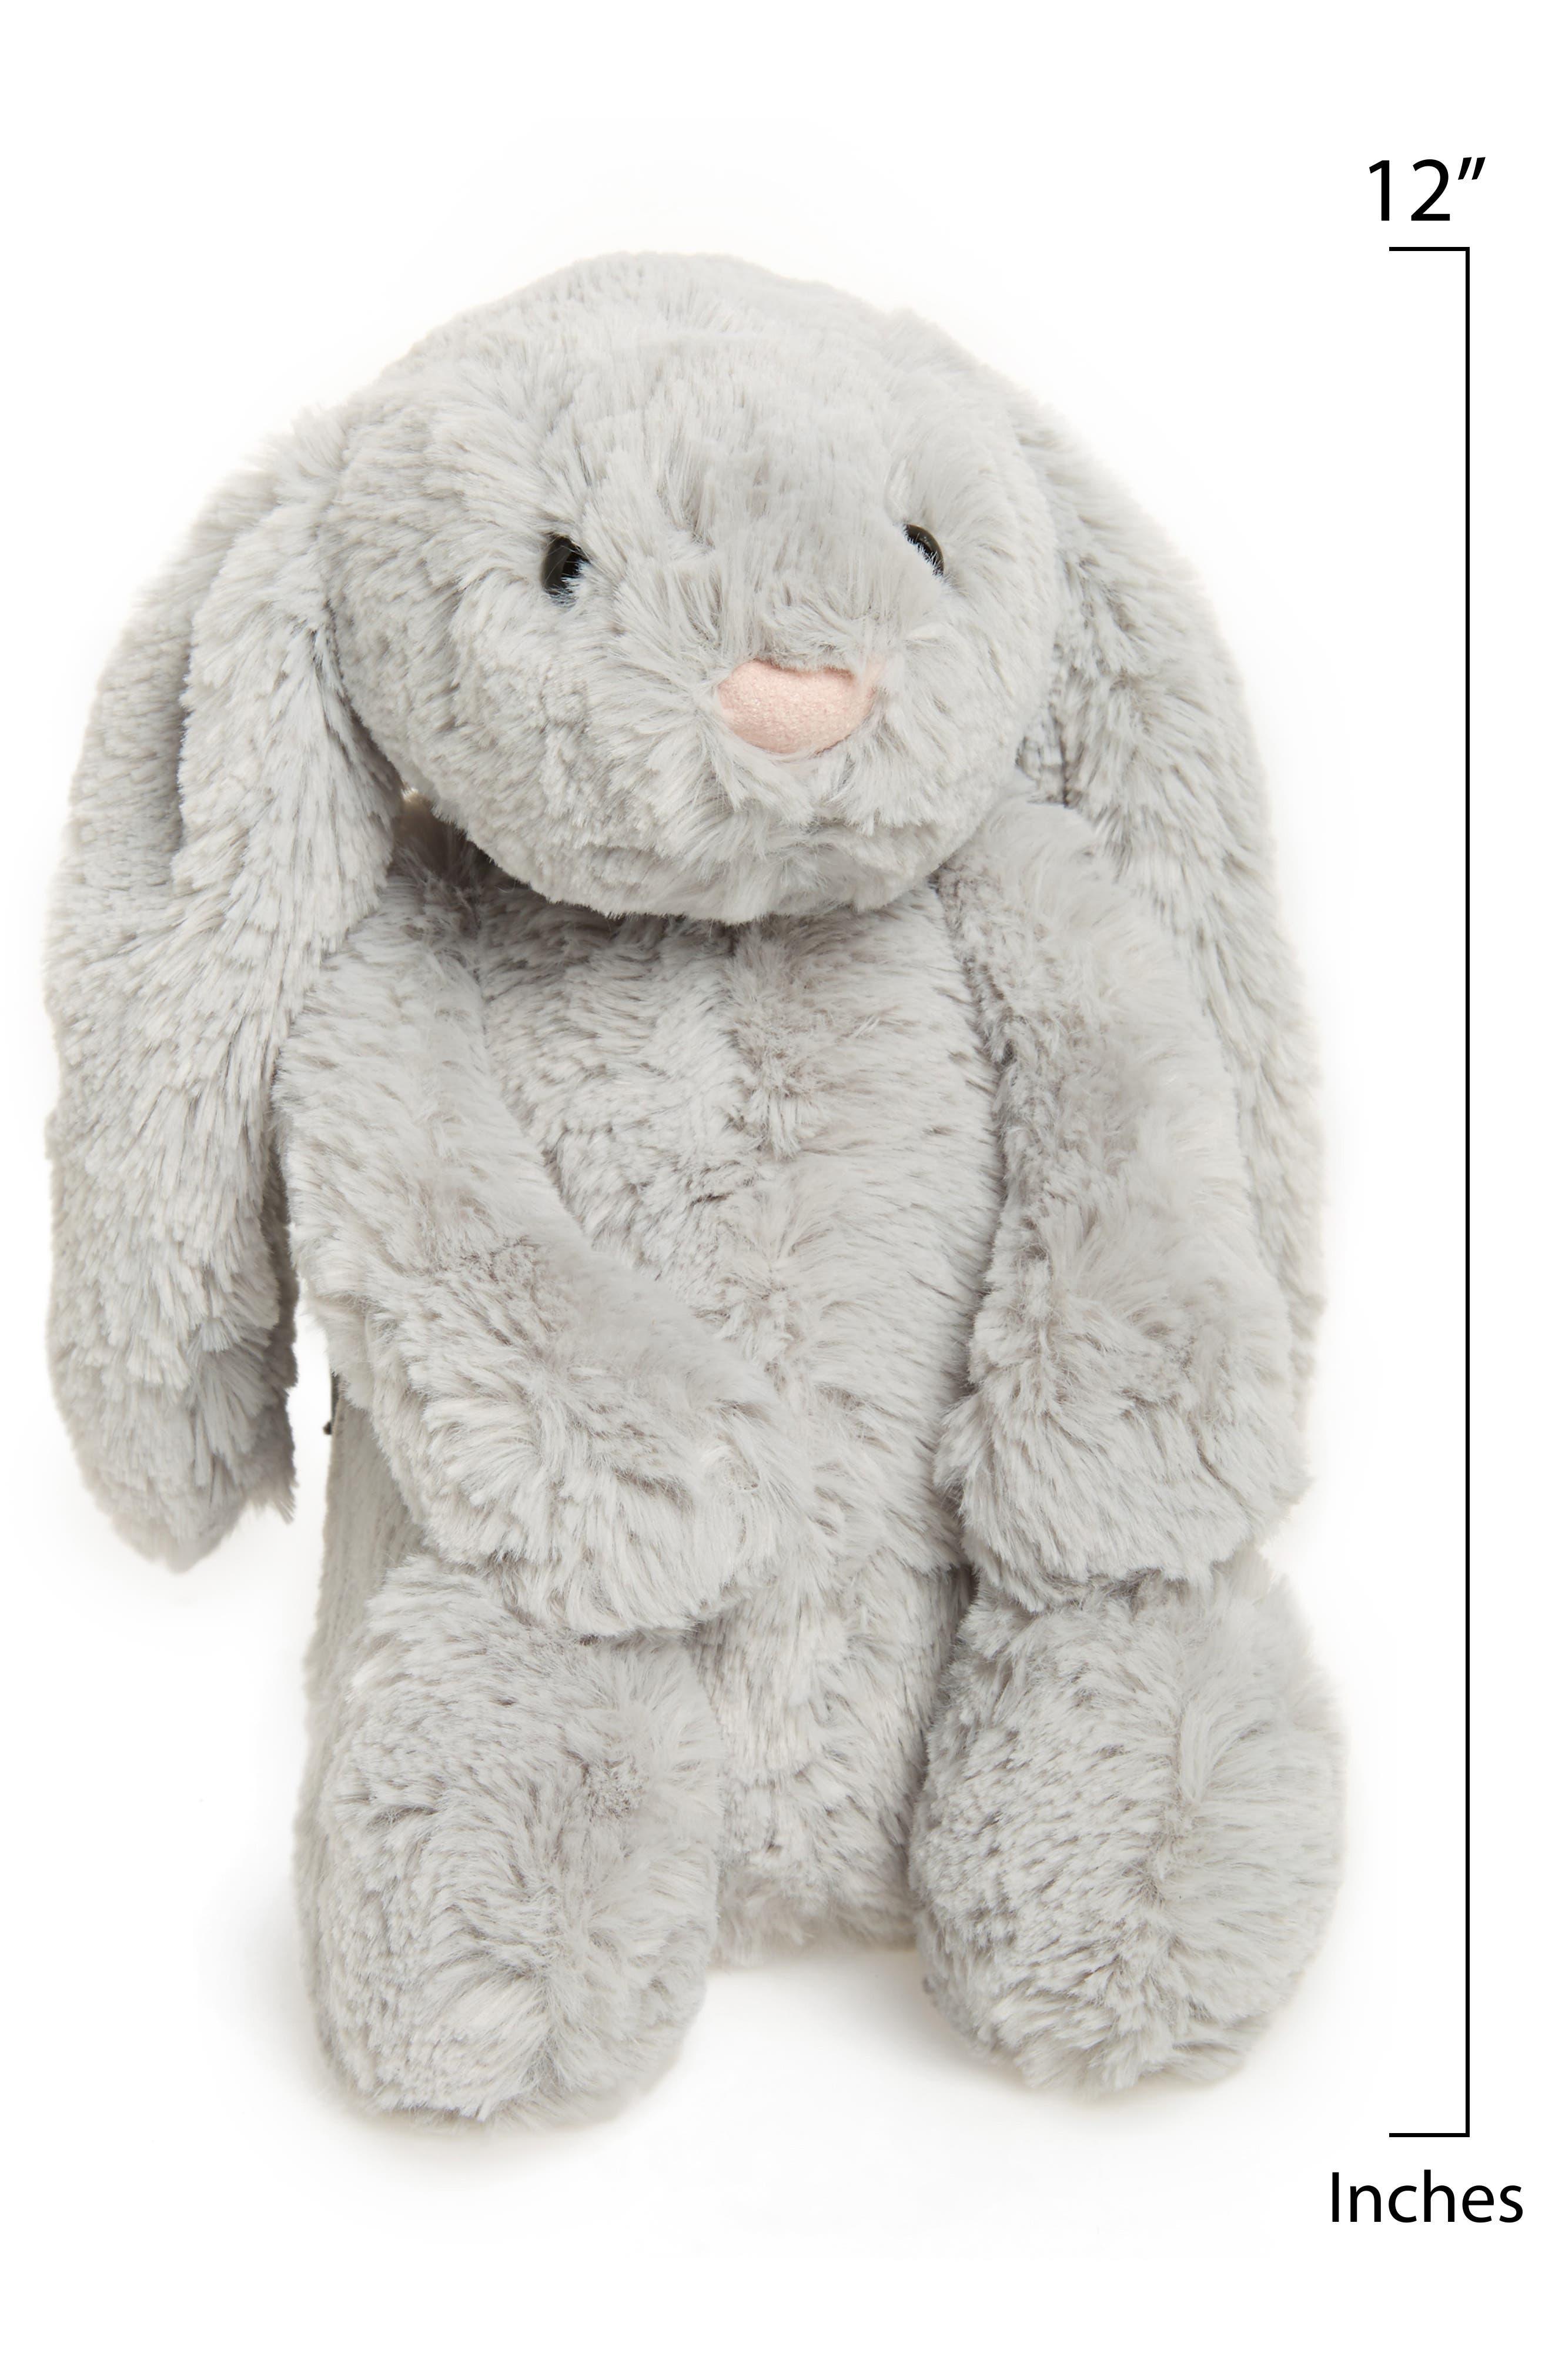 Jellycat Bashful Bunny Stuffed Animal Nordstrom